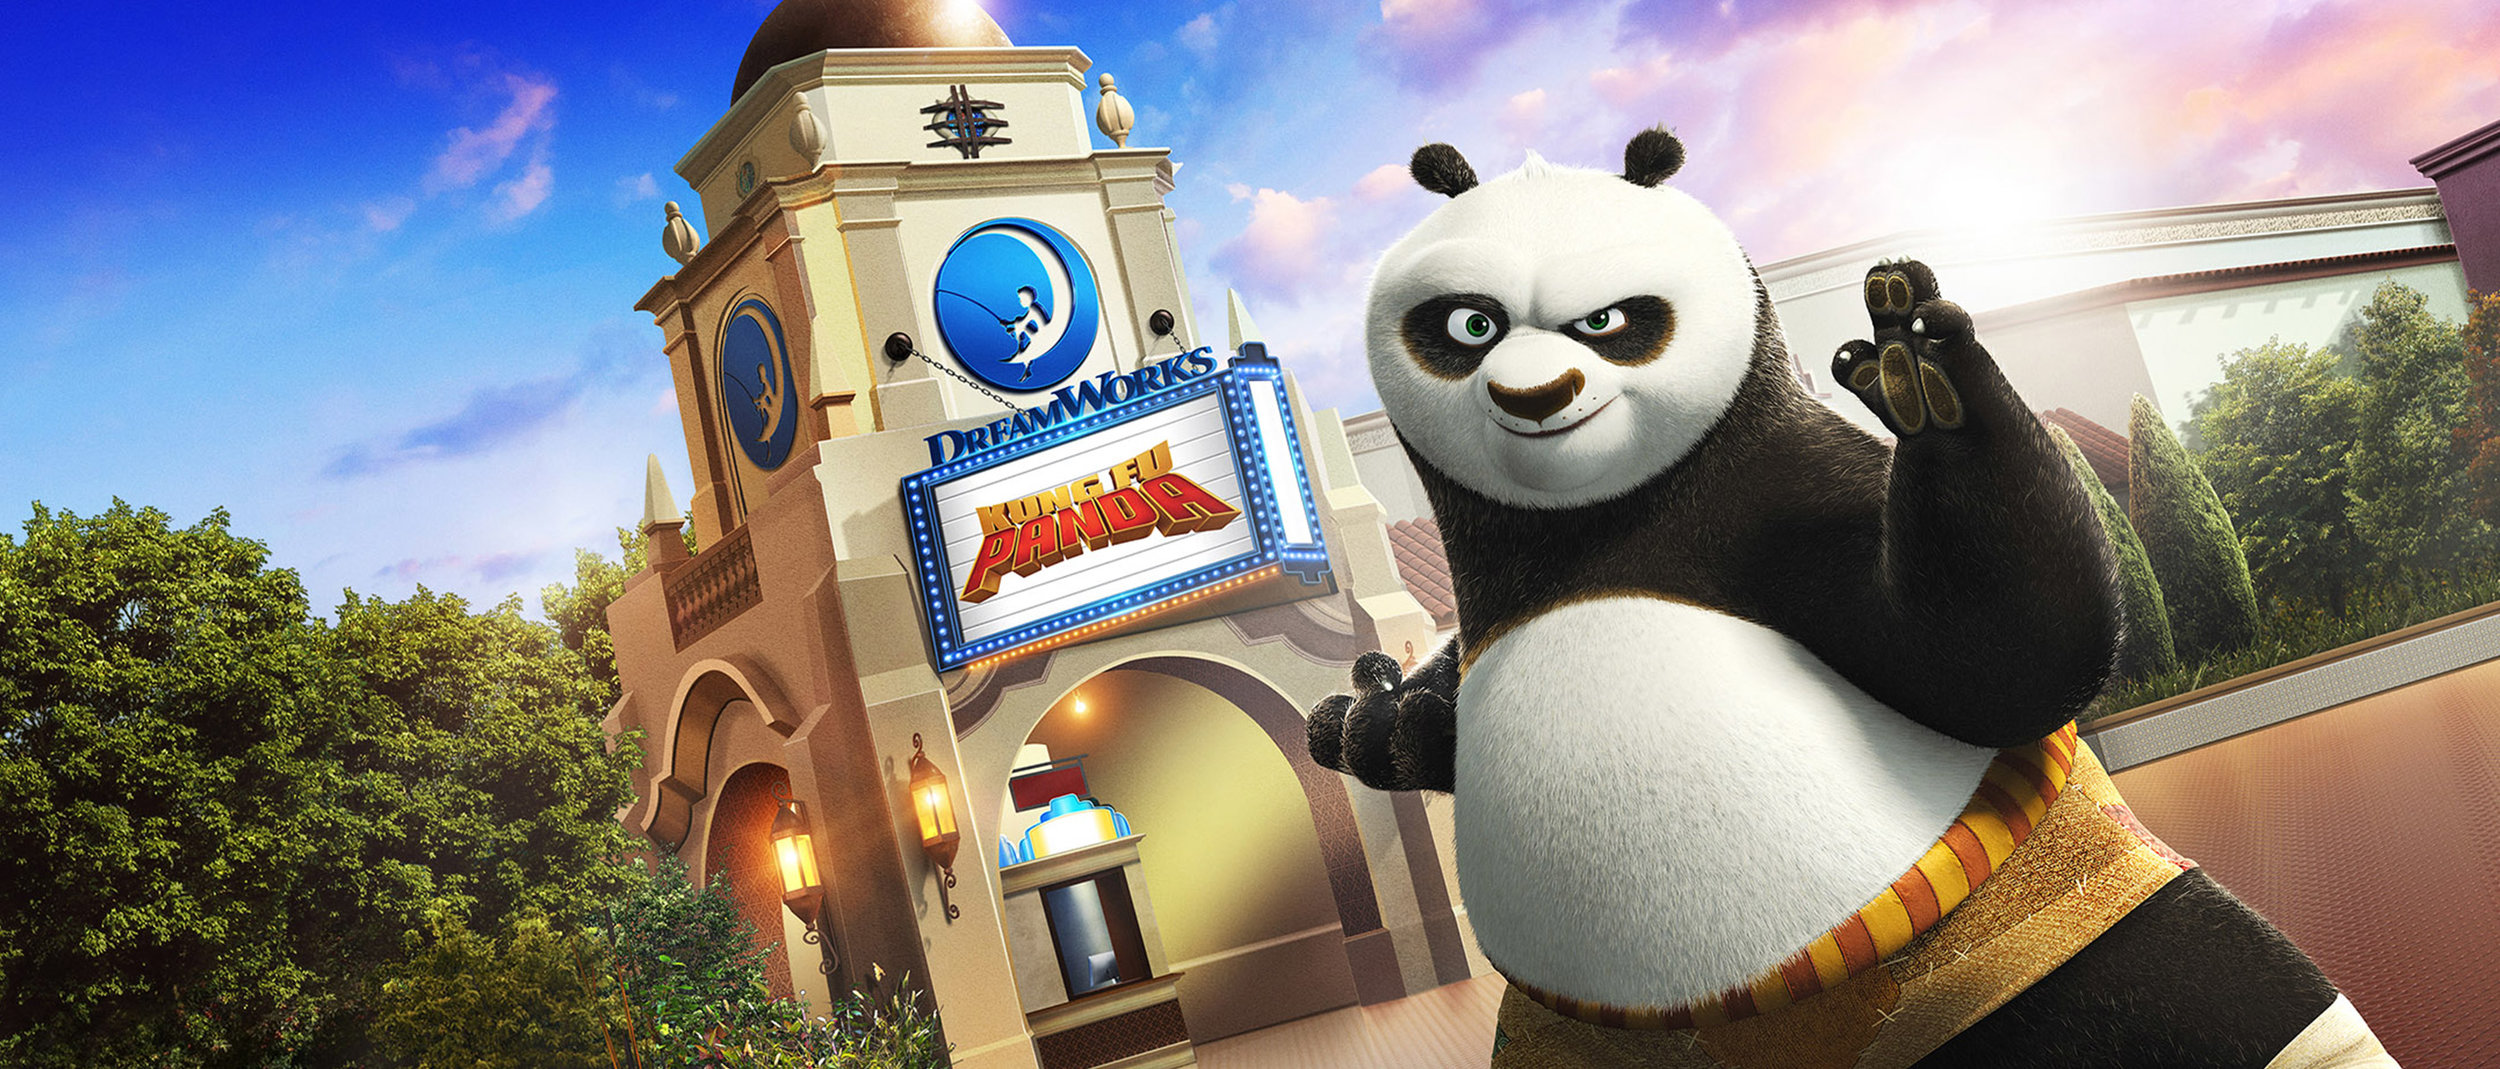 DreamWorks_Theatre_2800x1197.jpg